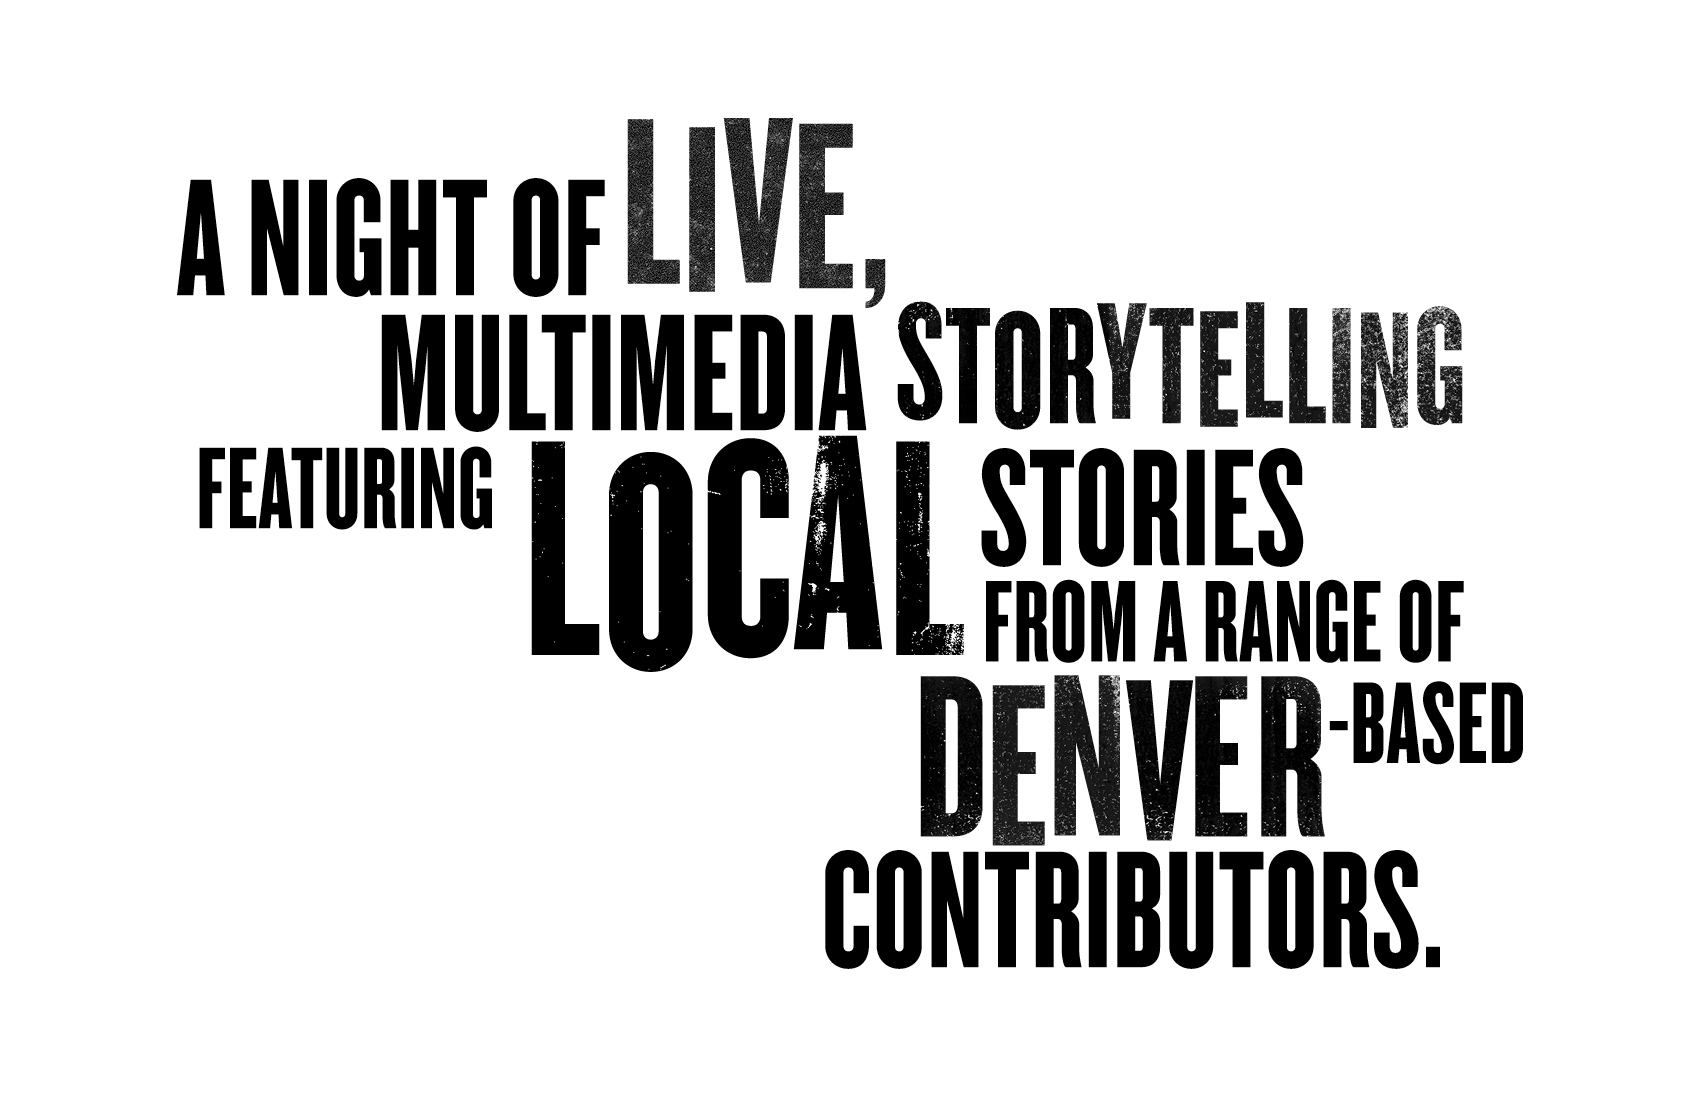 A night of live multimedia storytelling!